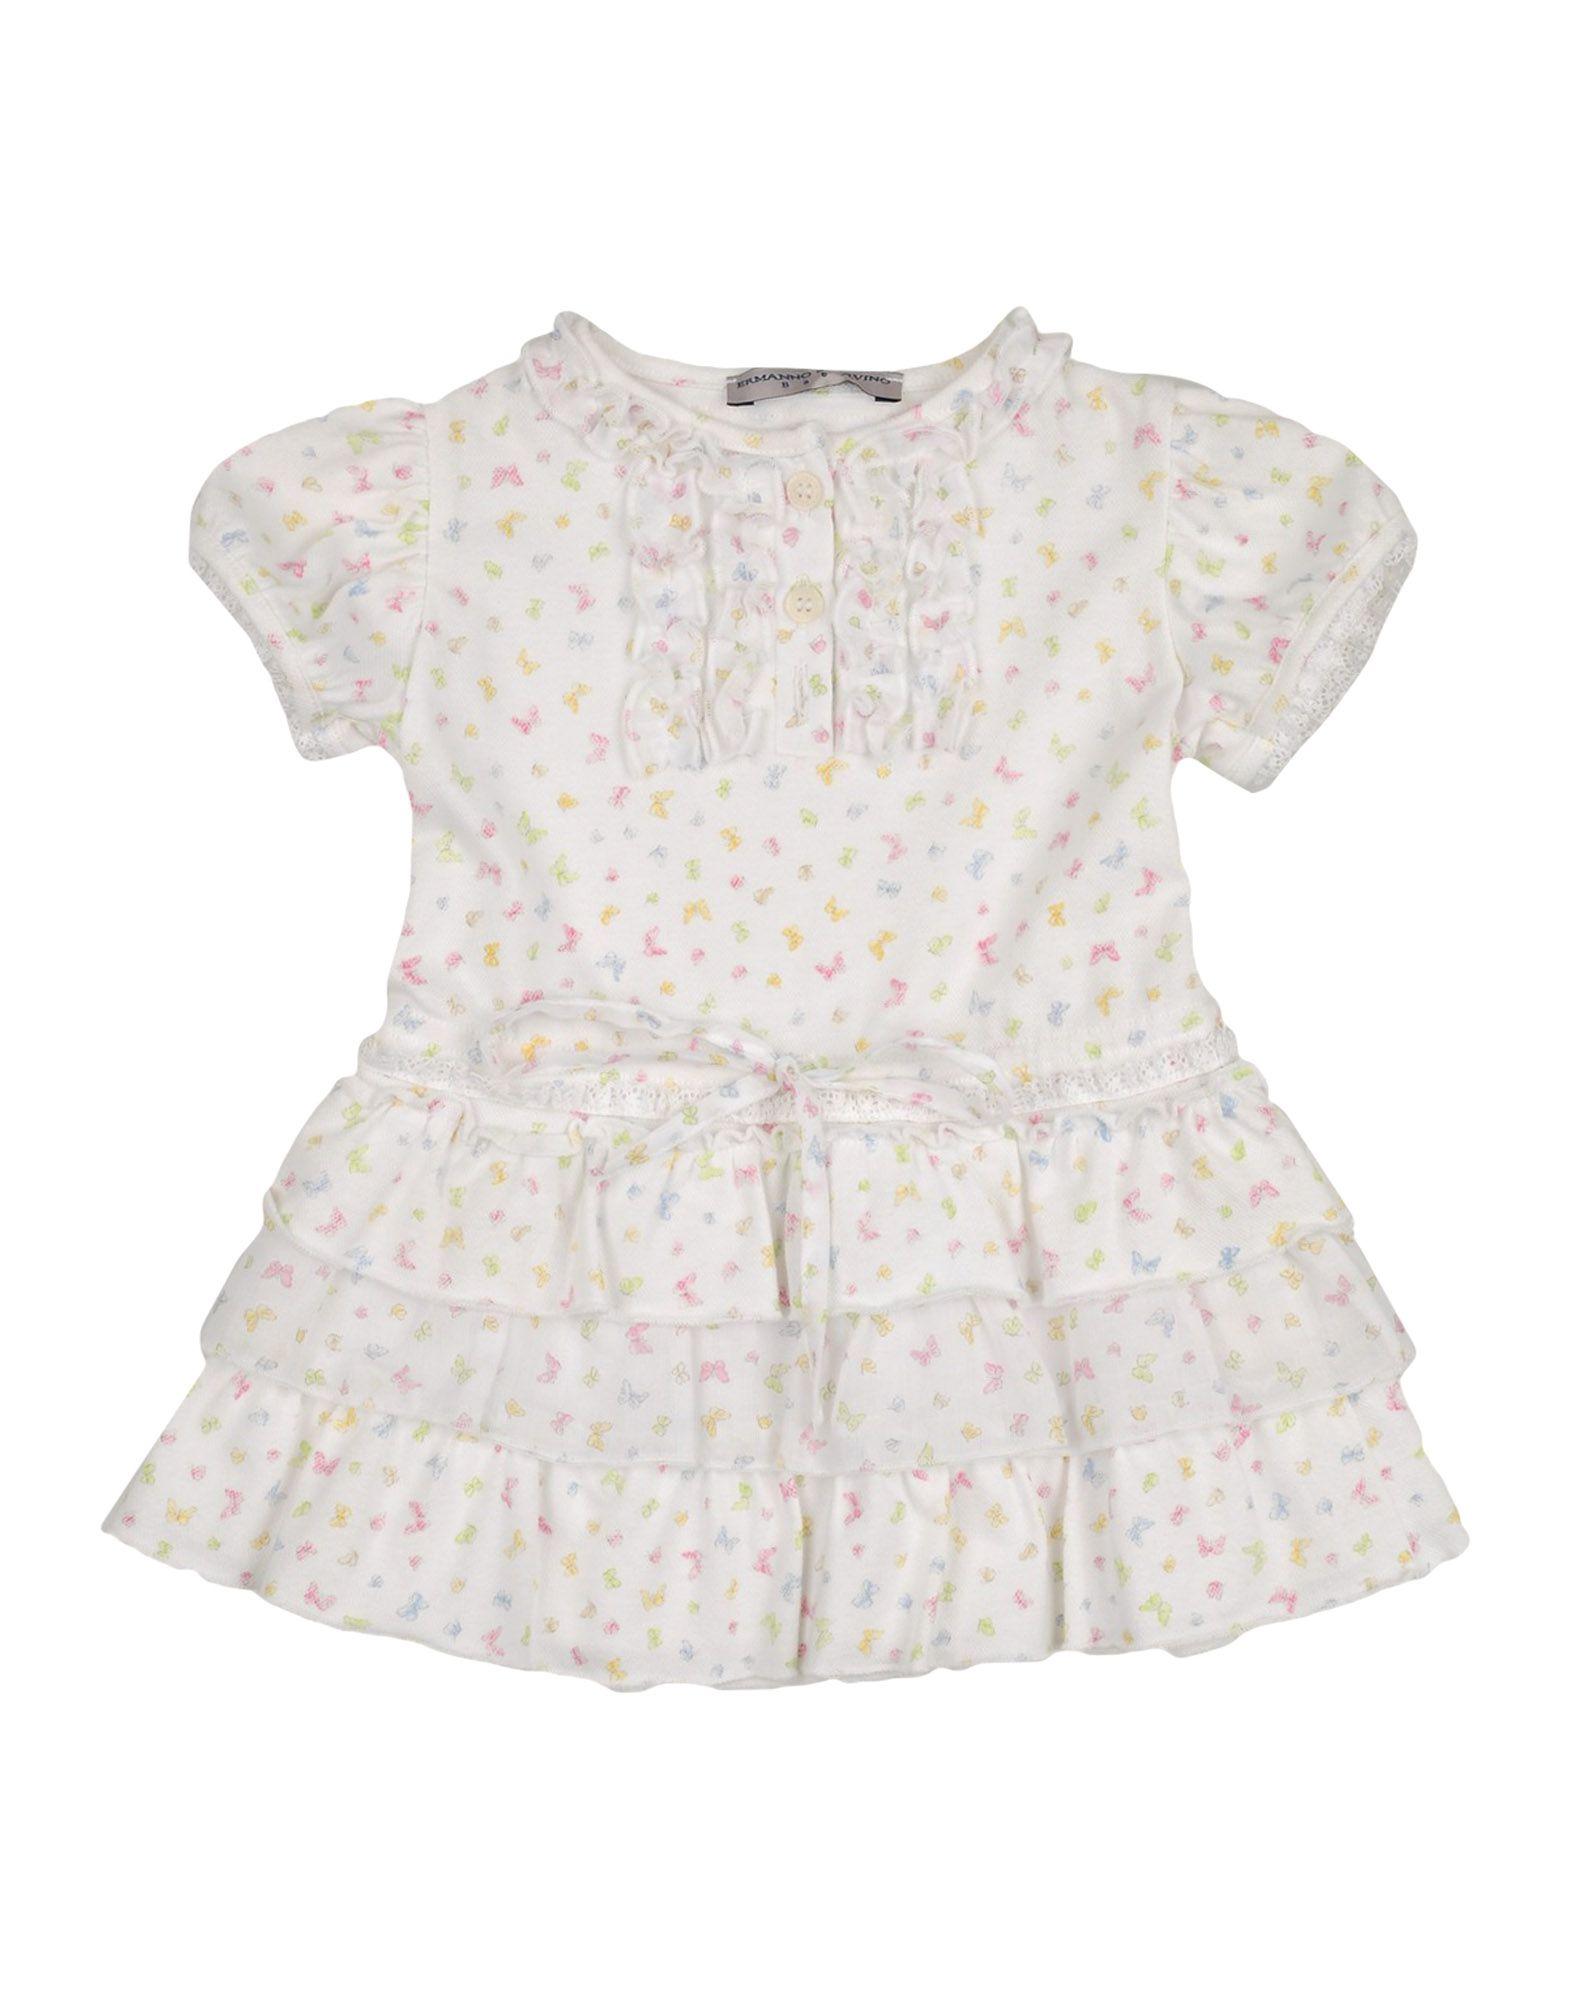 ERMANNO SCERVINO BABY Dresses